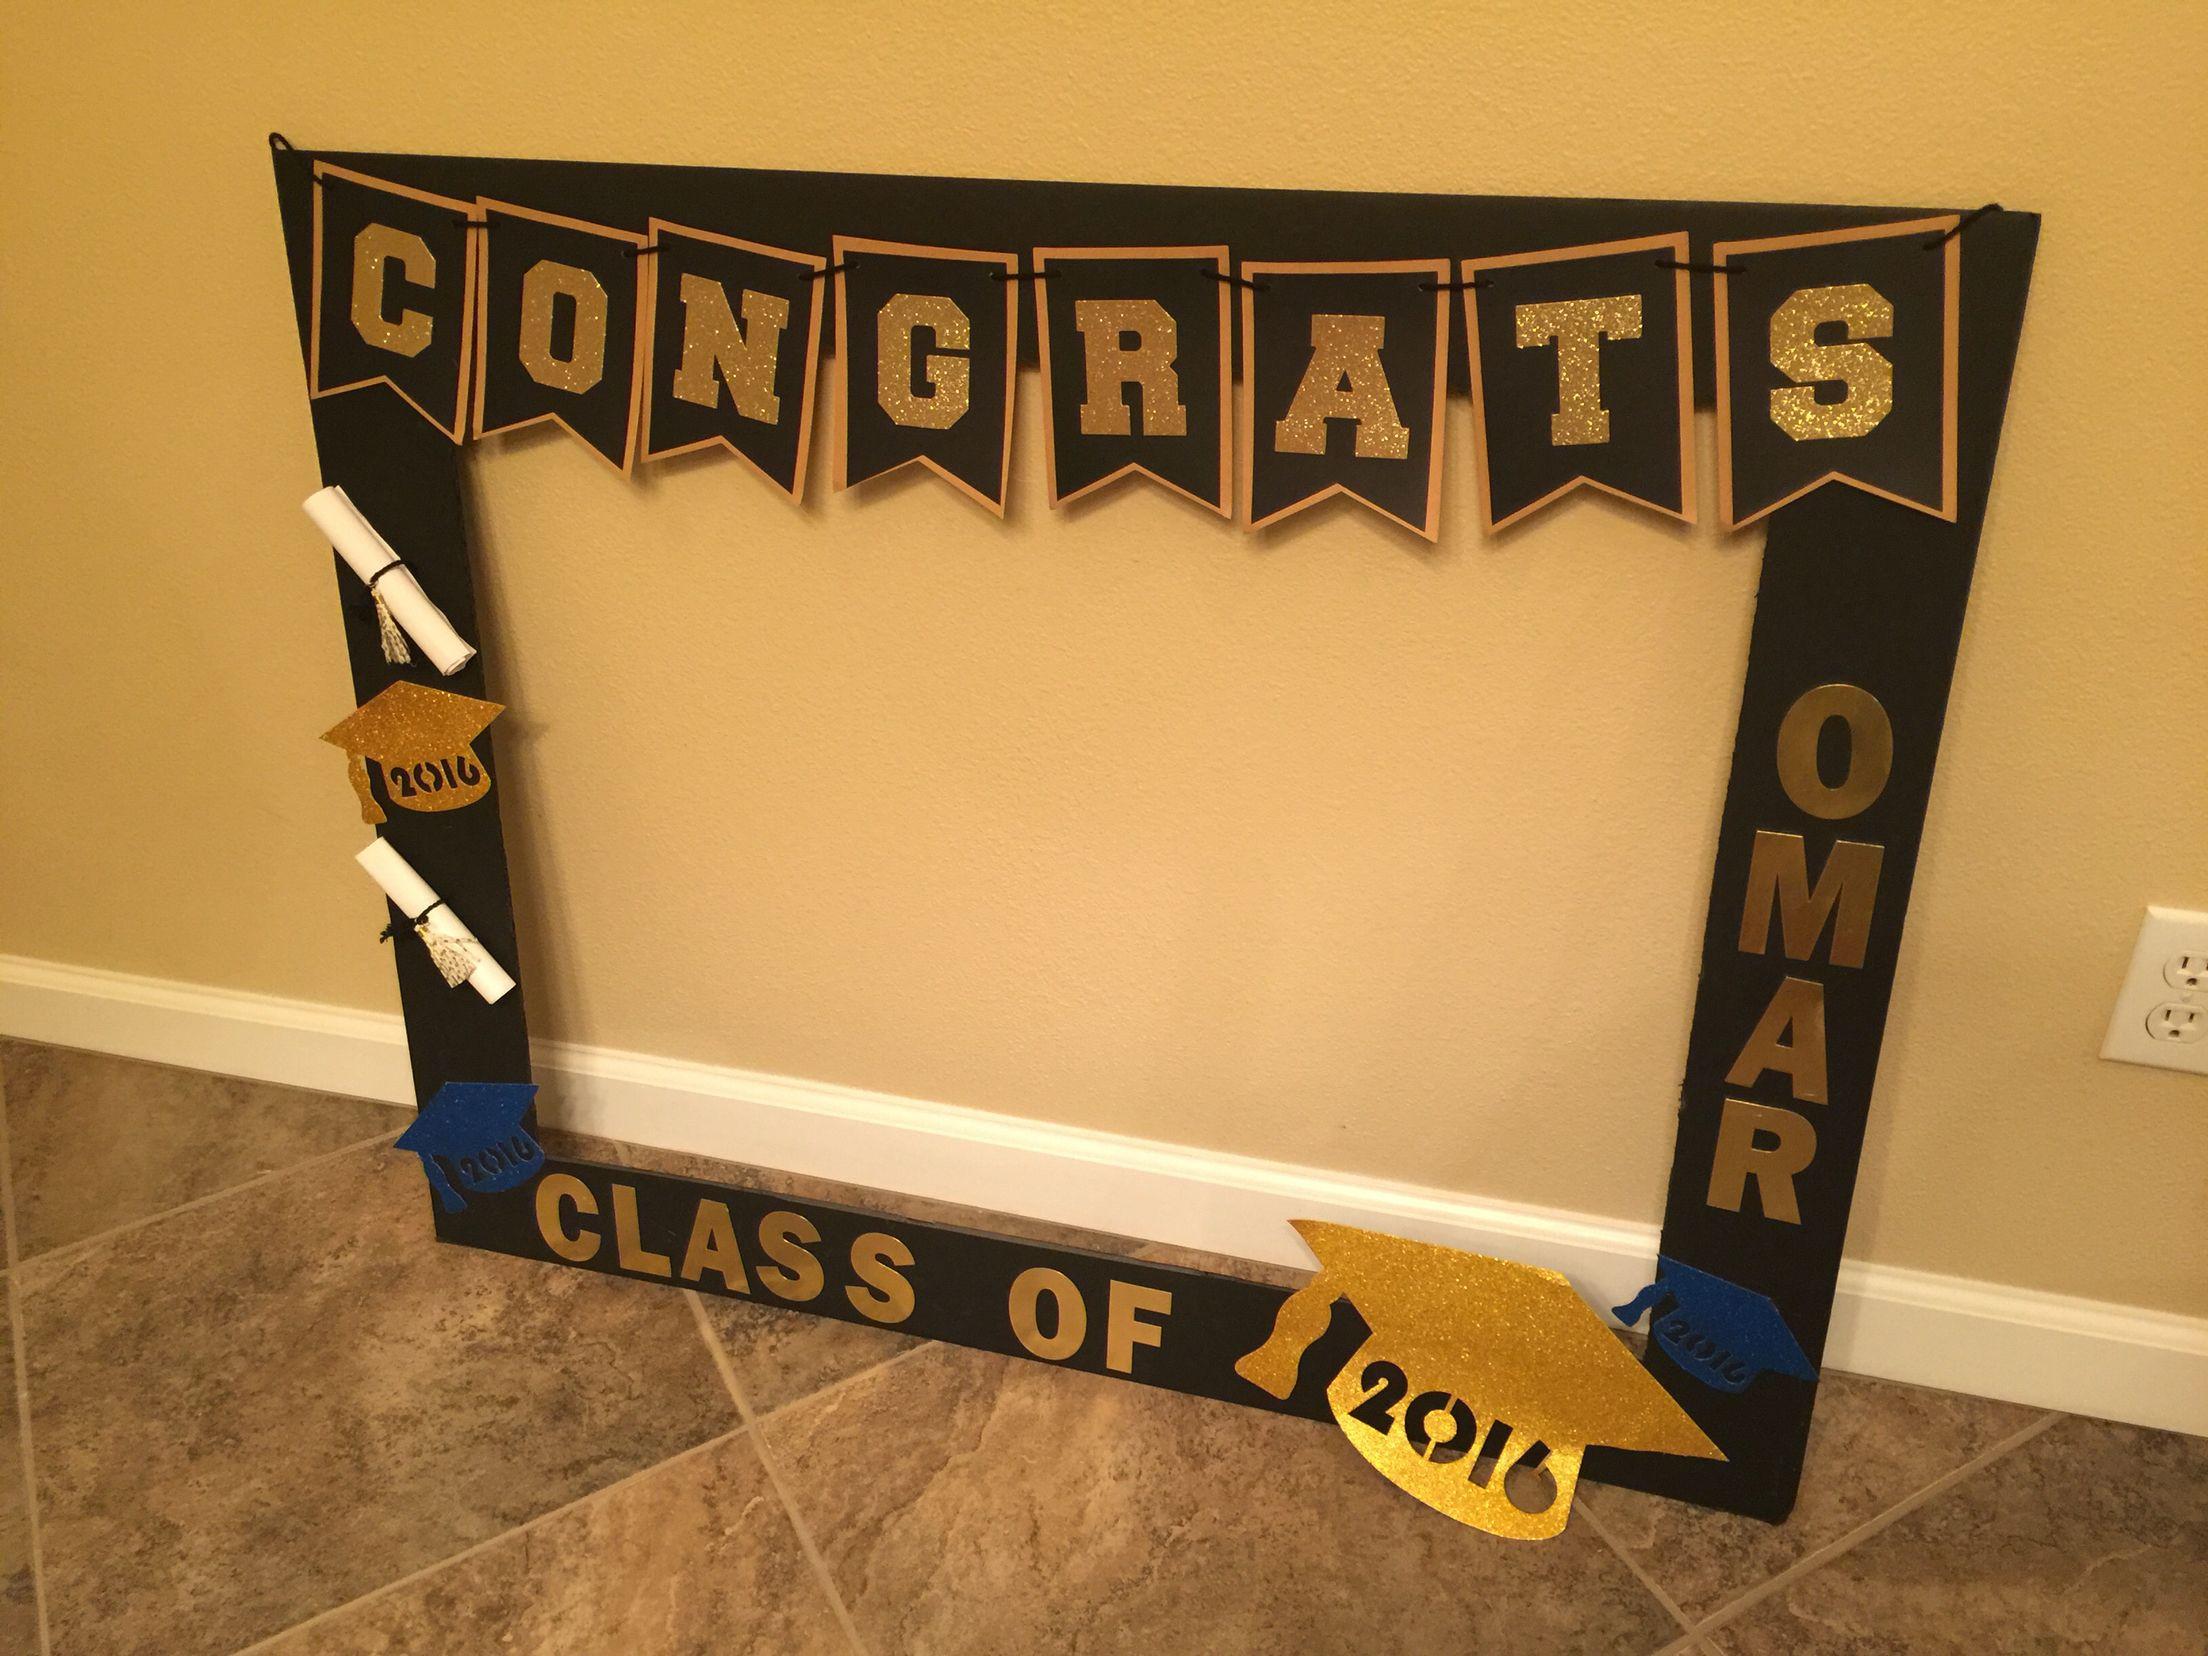 Photo Booth Ideas For Graduation Party  Graduation DIY photo booth DIY